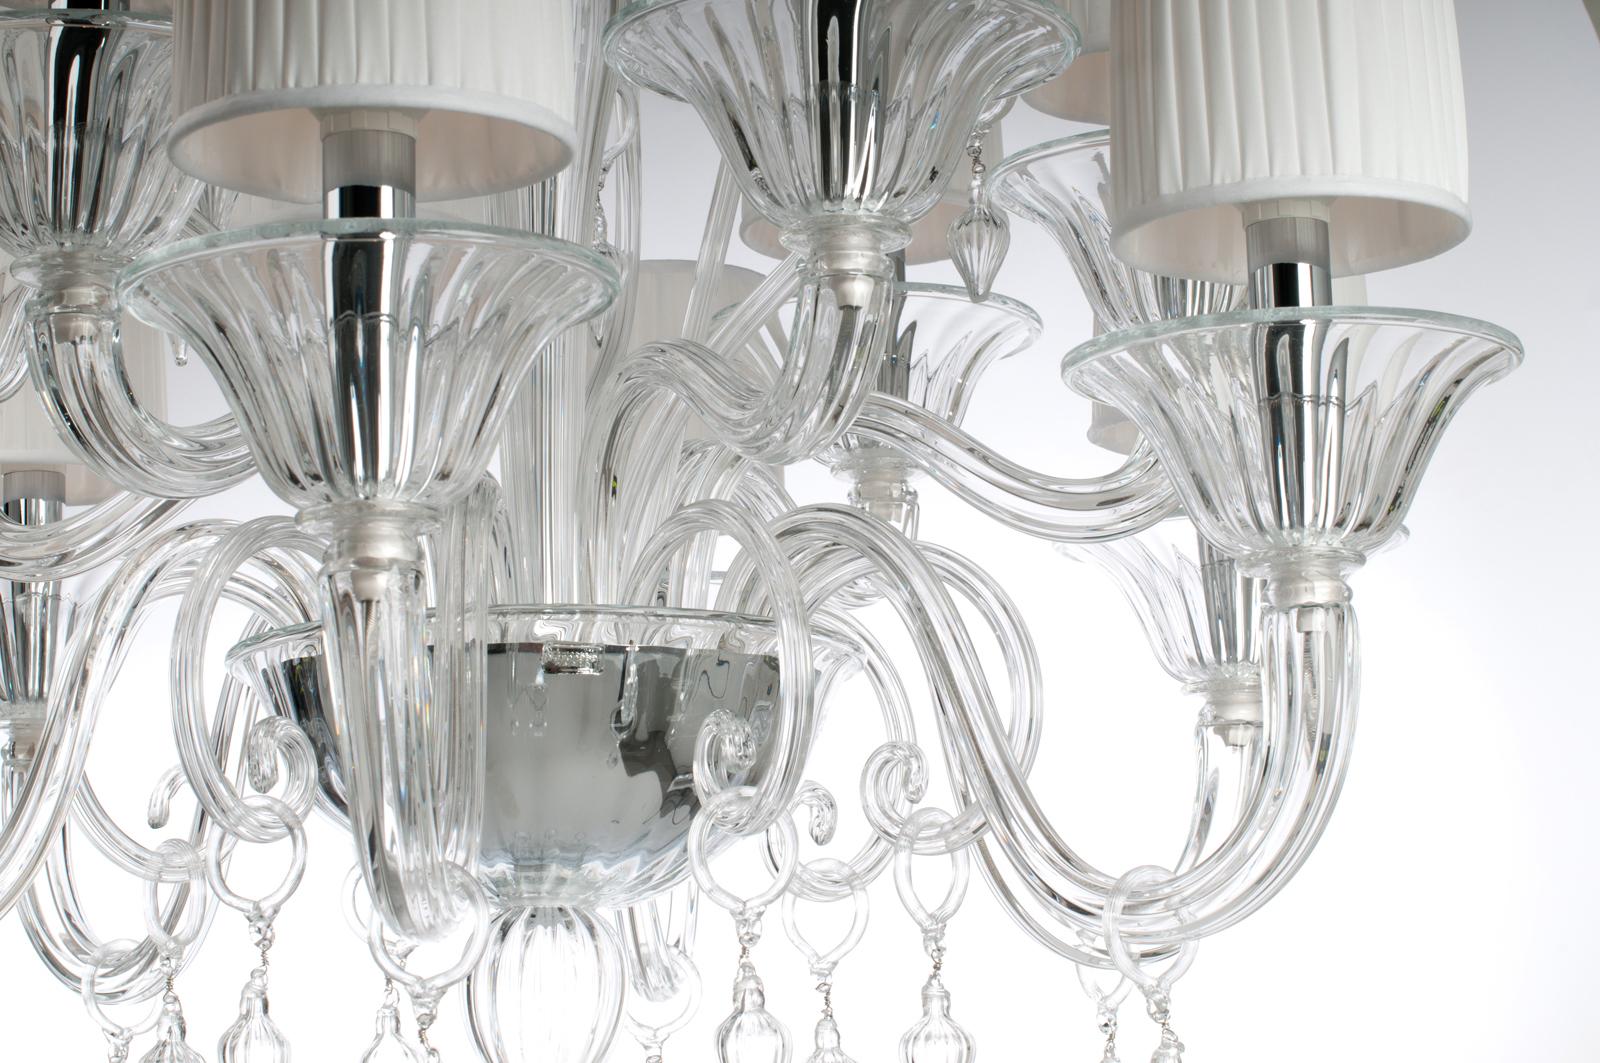 cachemire-lustre-chandelier-veronese-10.jpg